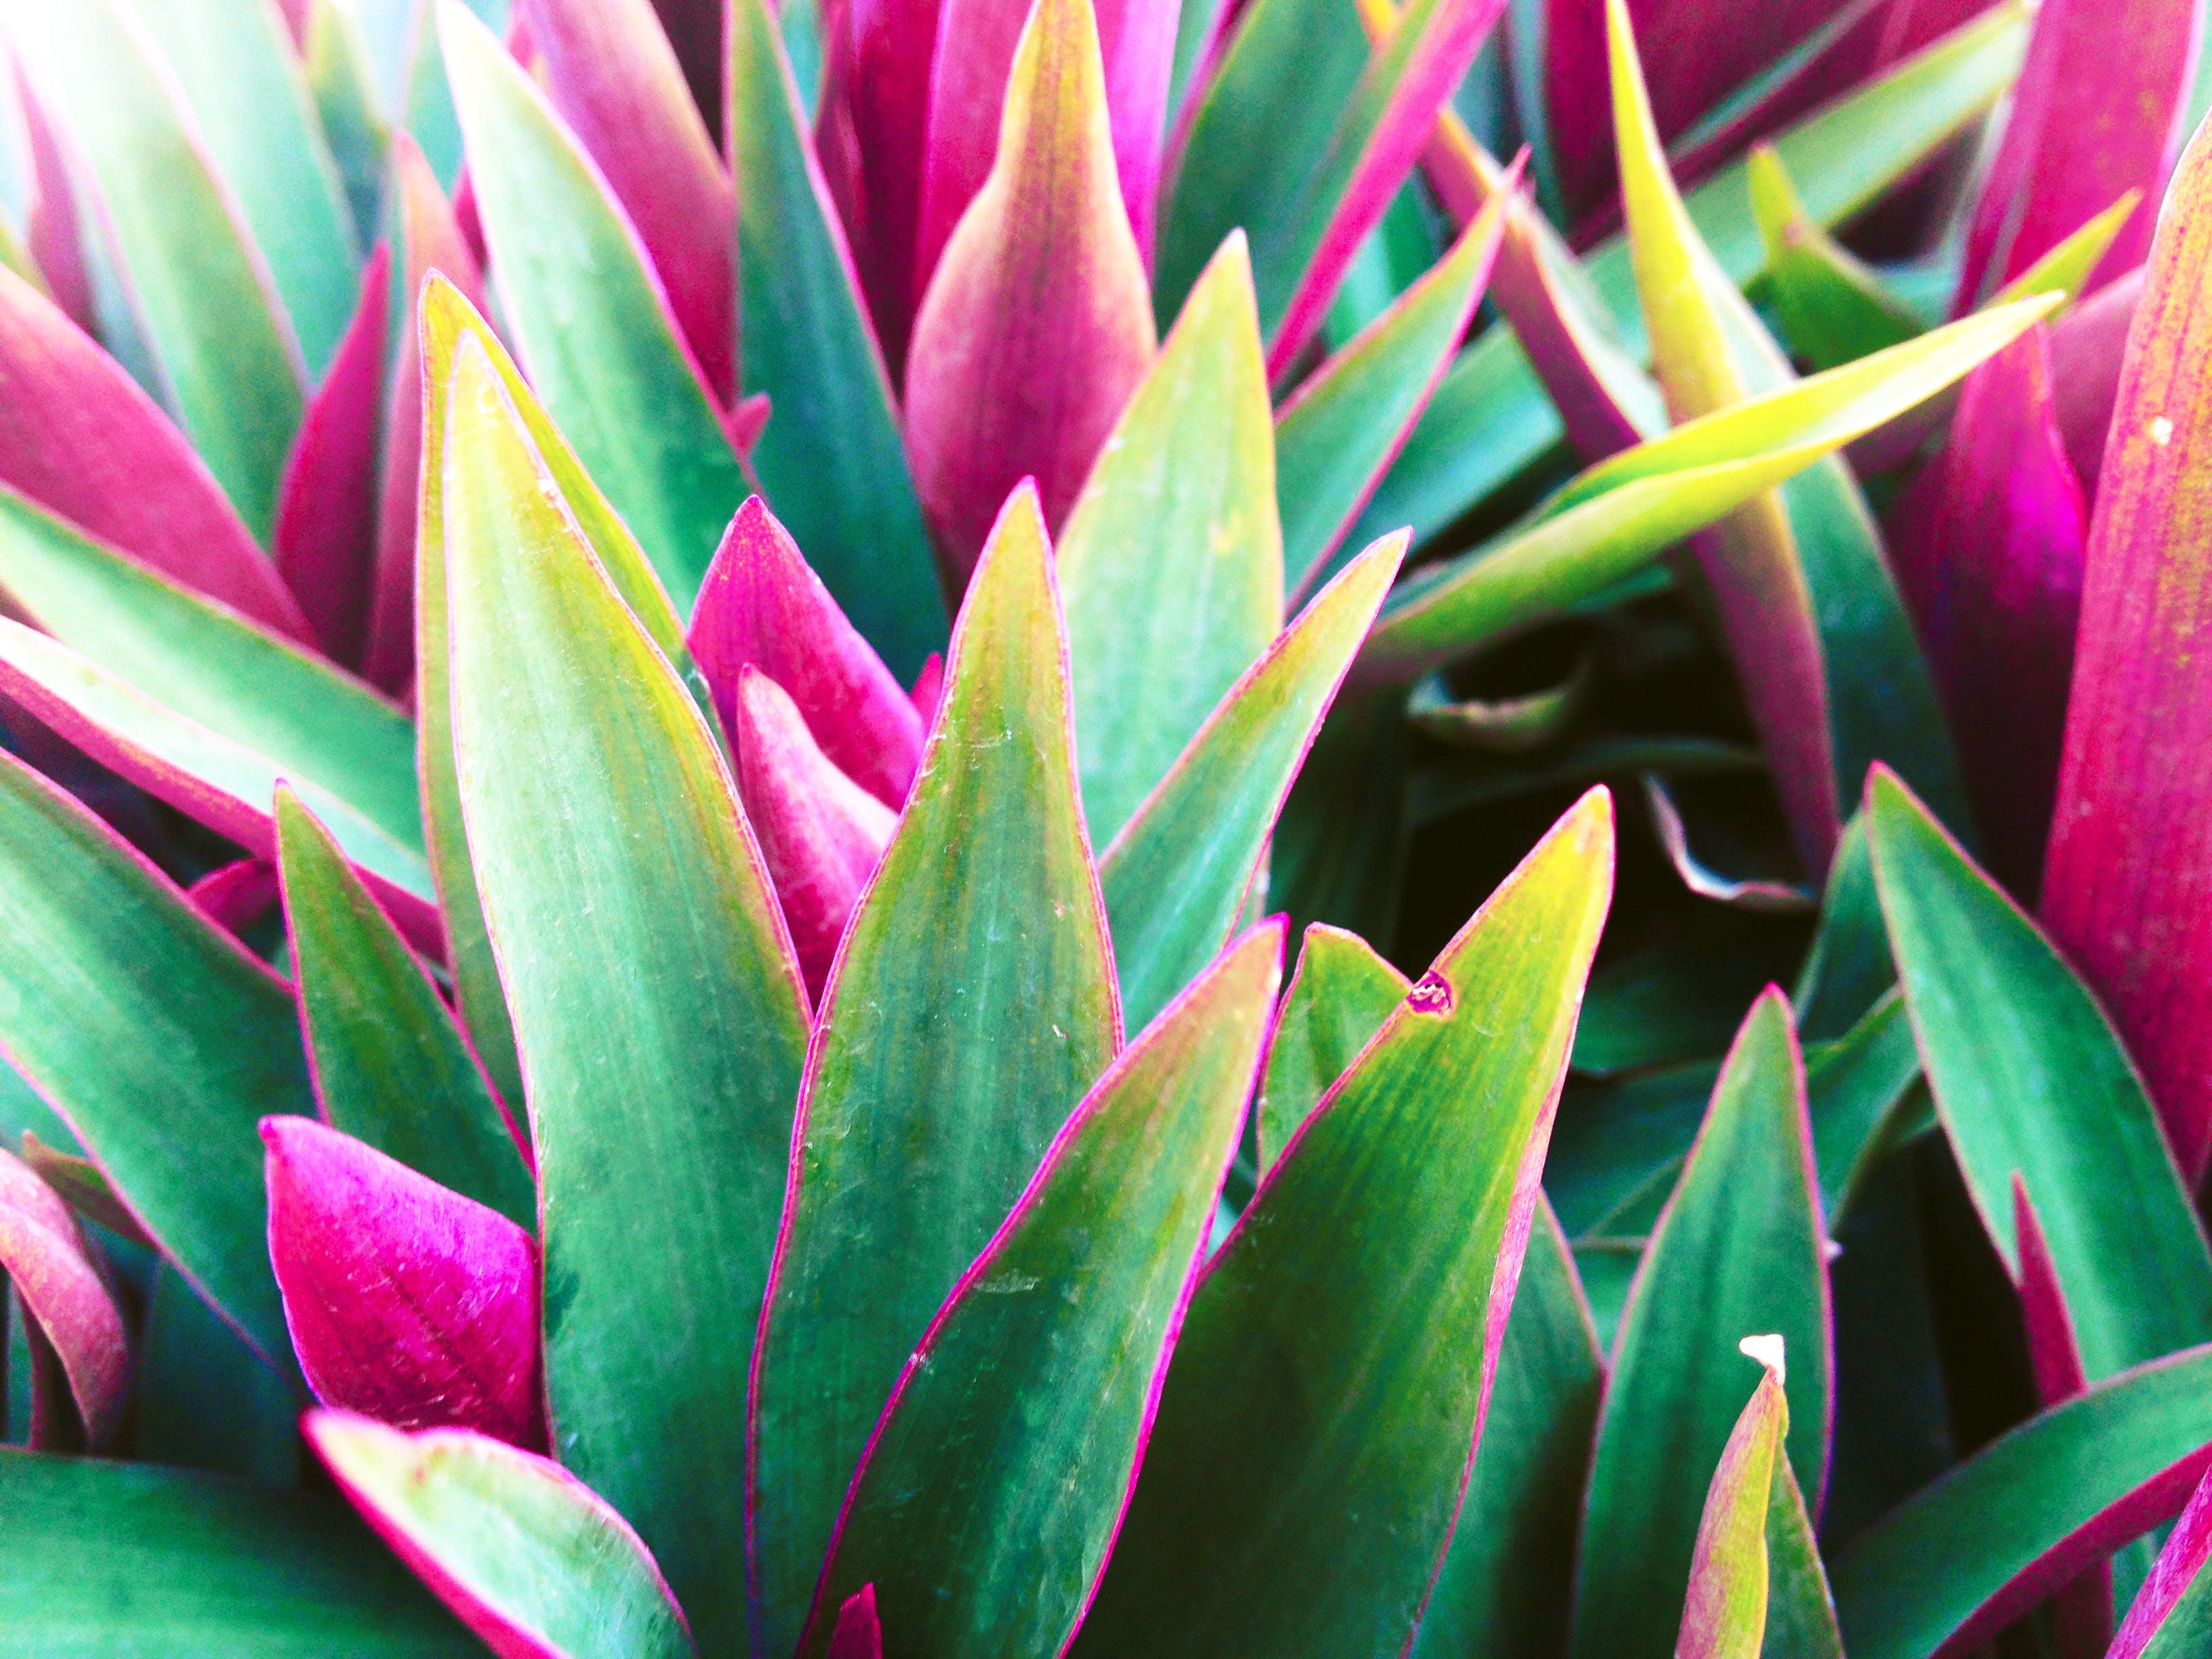 Kostenloses Stock Foto zu gras, grün, natur, rot